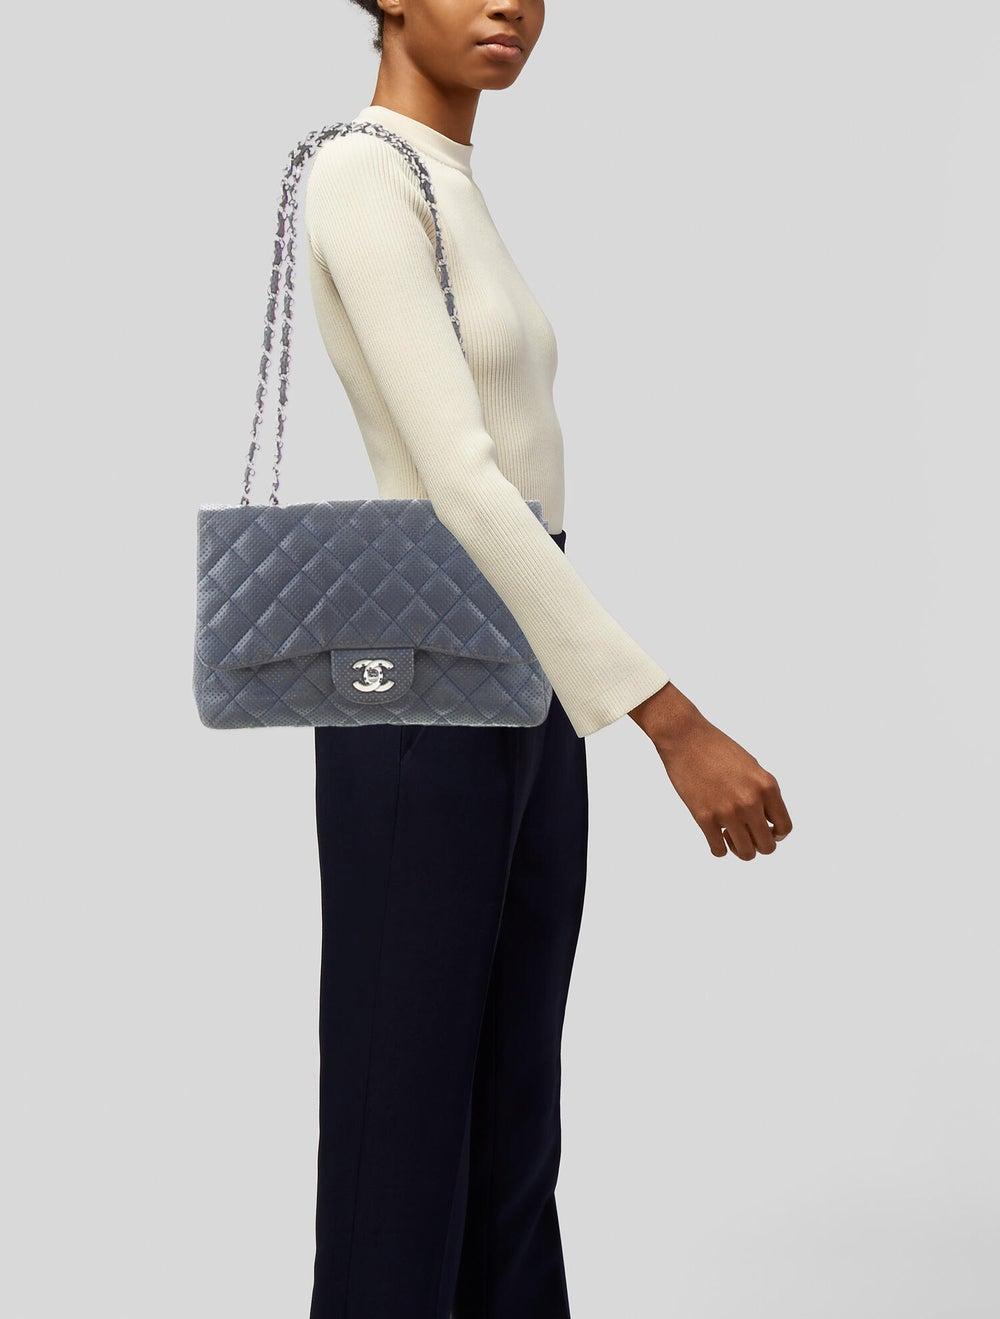 Chanel Perforated Classic Jumbo Single Flap Bag B… - image 2